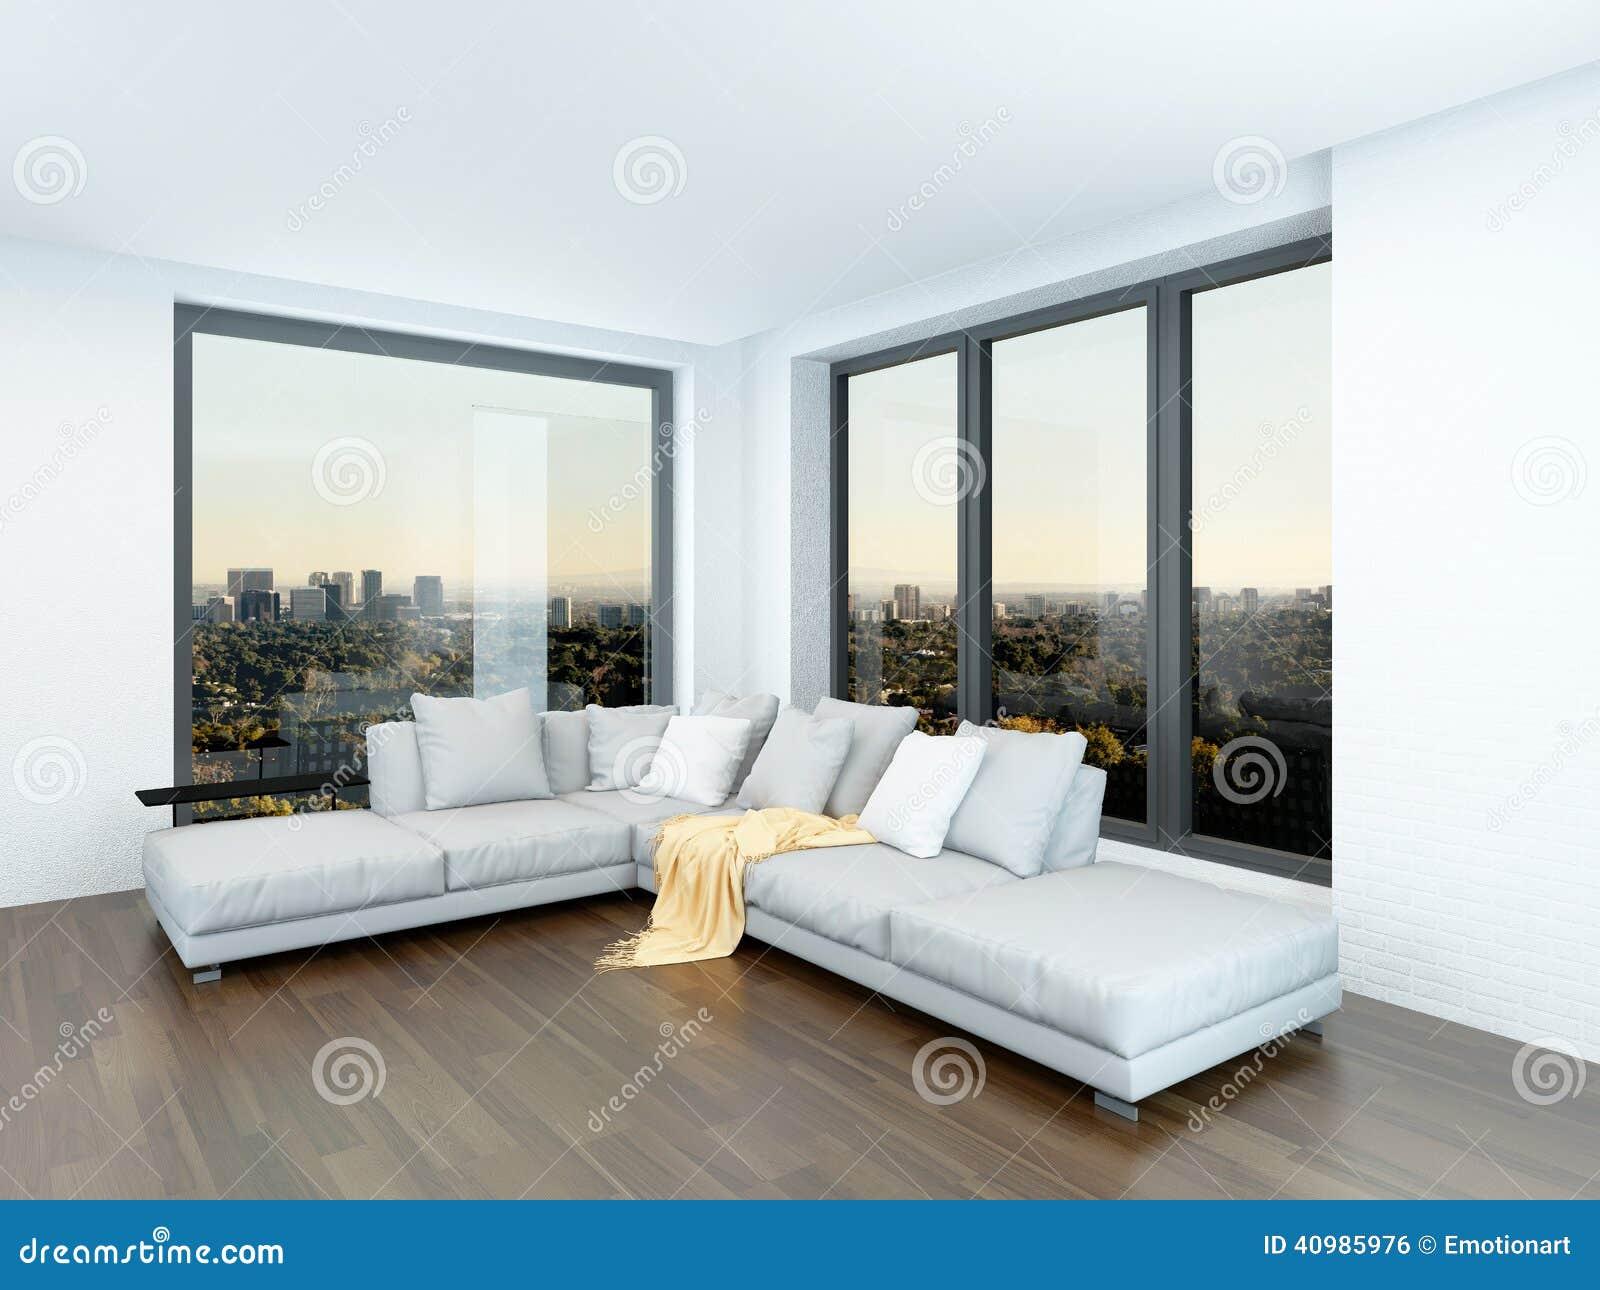 Sala De Estar Minimalista Moderno ~ Interior minimalista moderno da sala de estar com uma unidade de canto